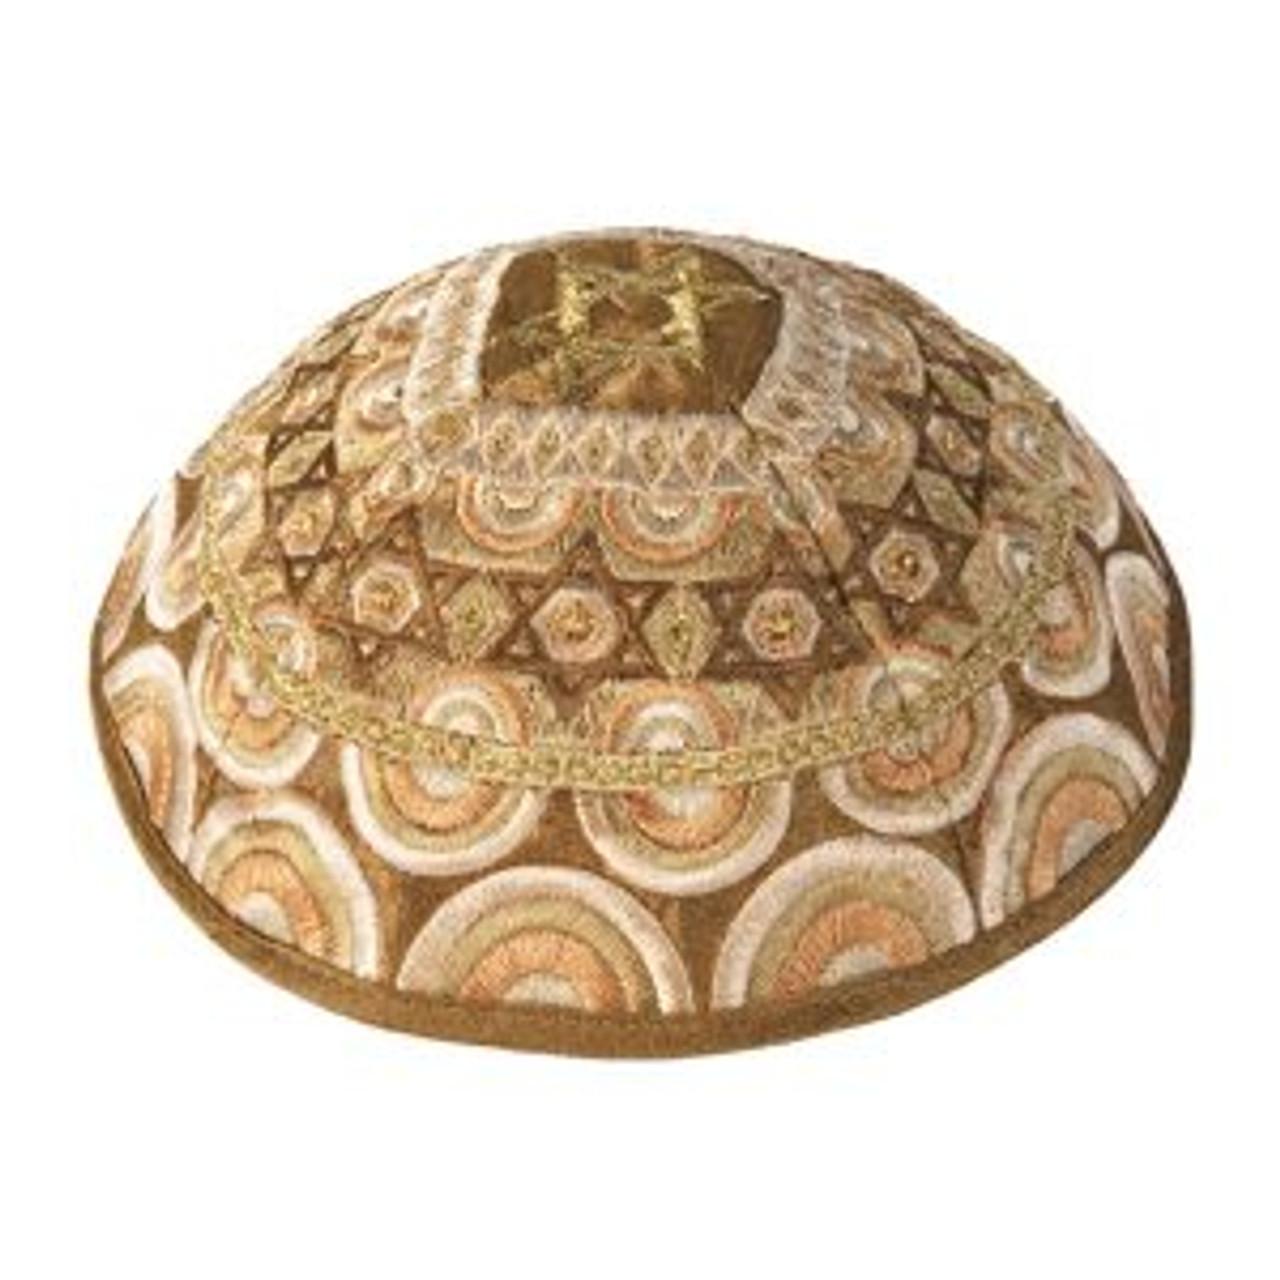 Magen David Brown & Gold Embroidered Kippah